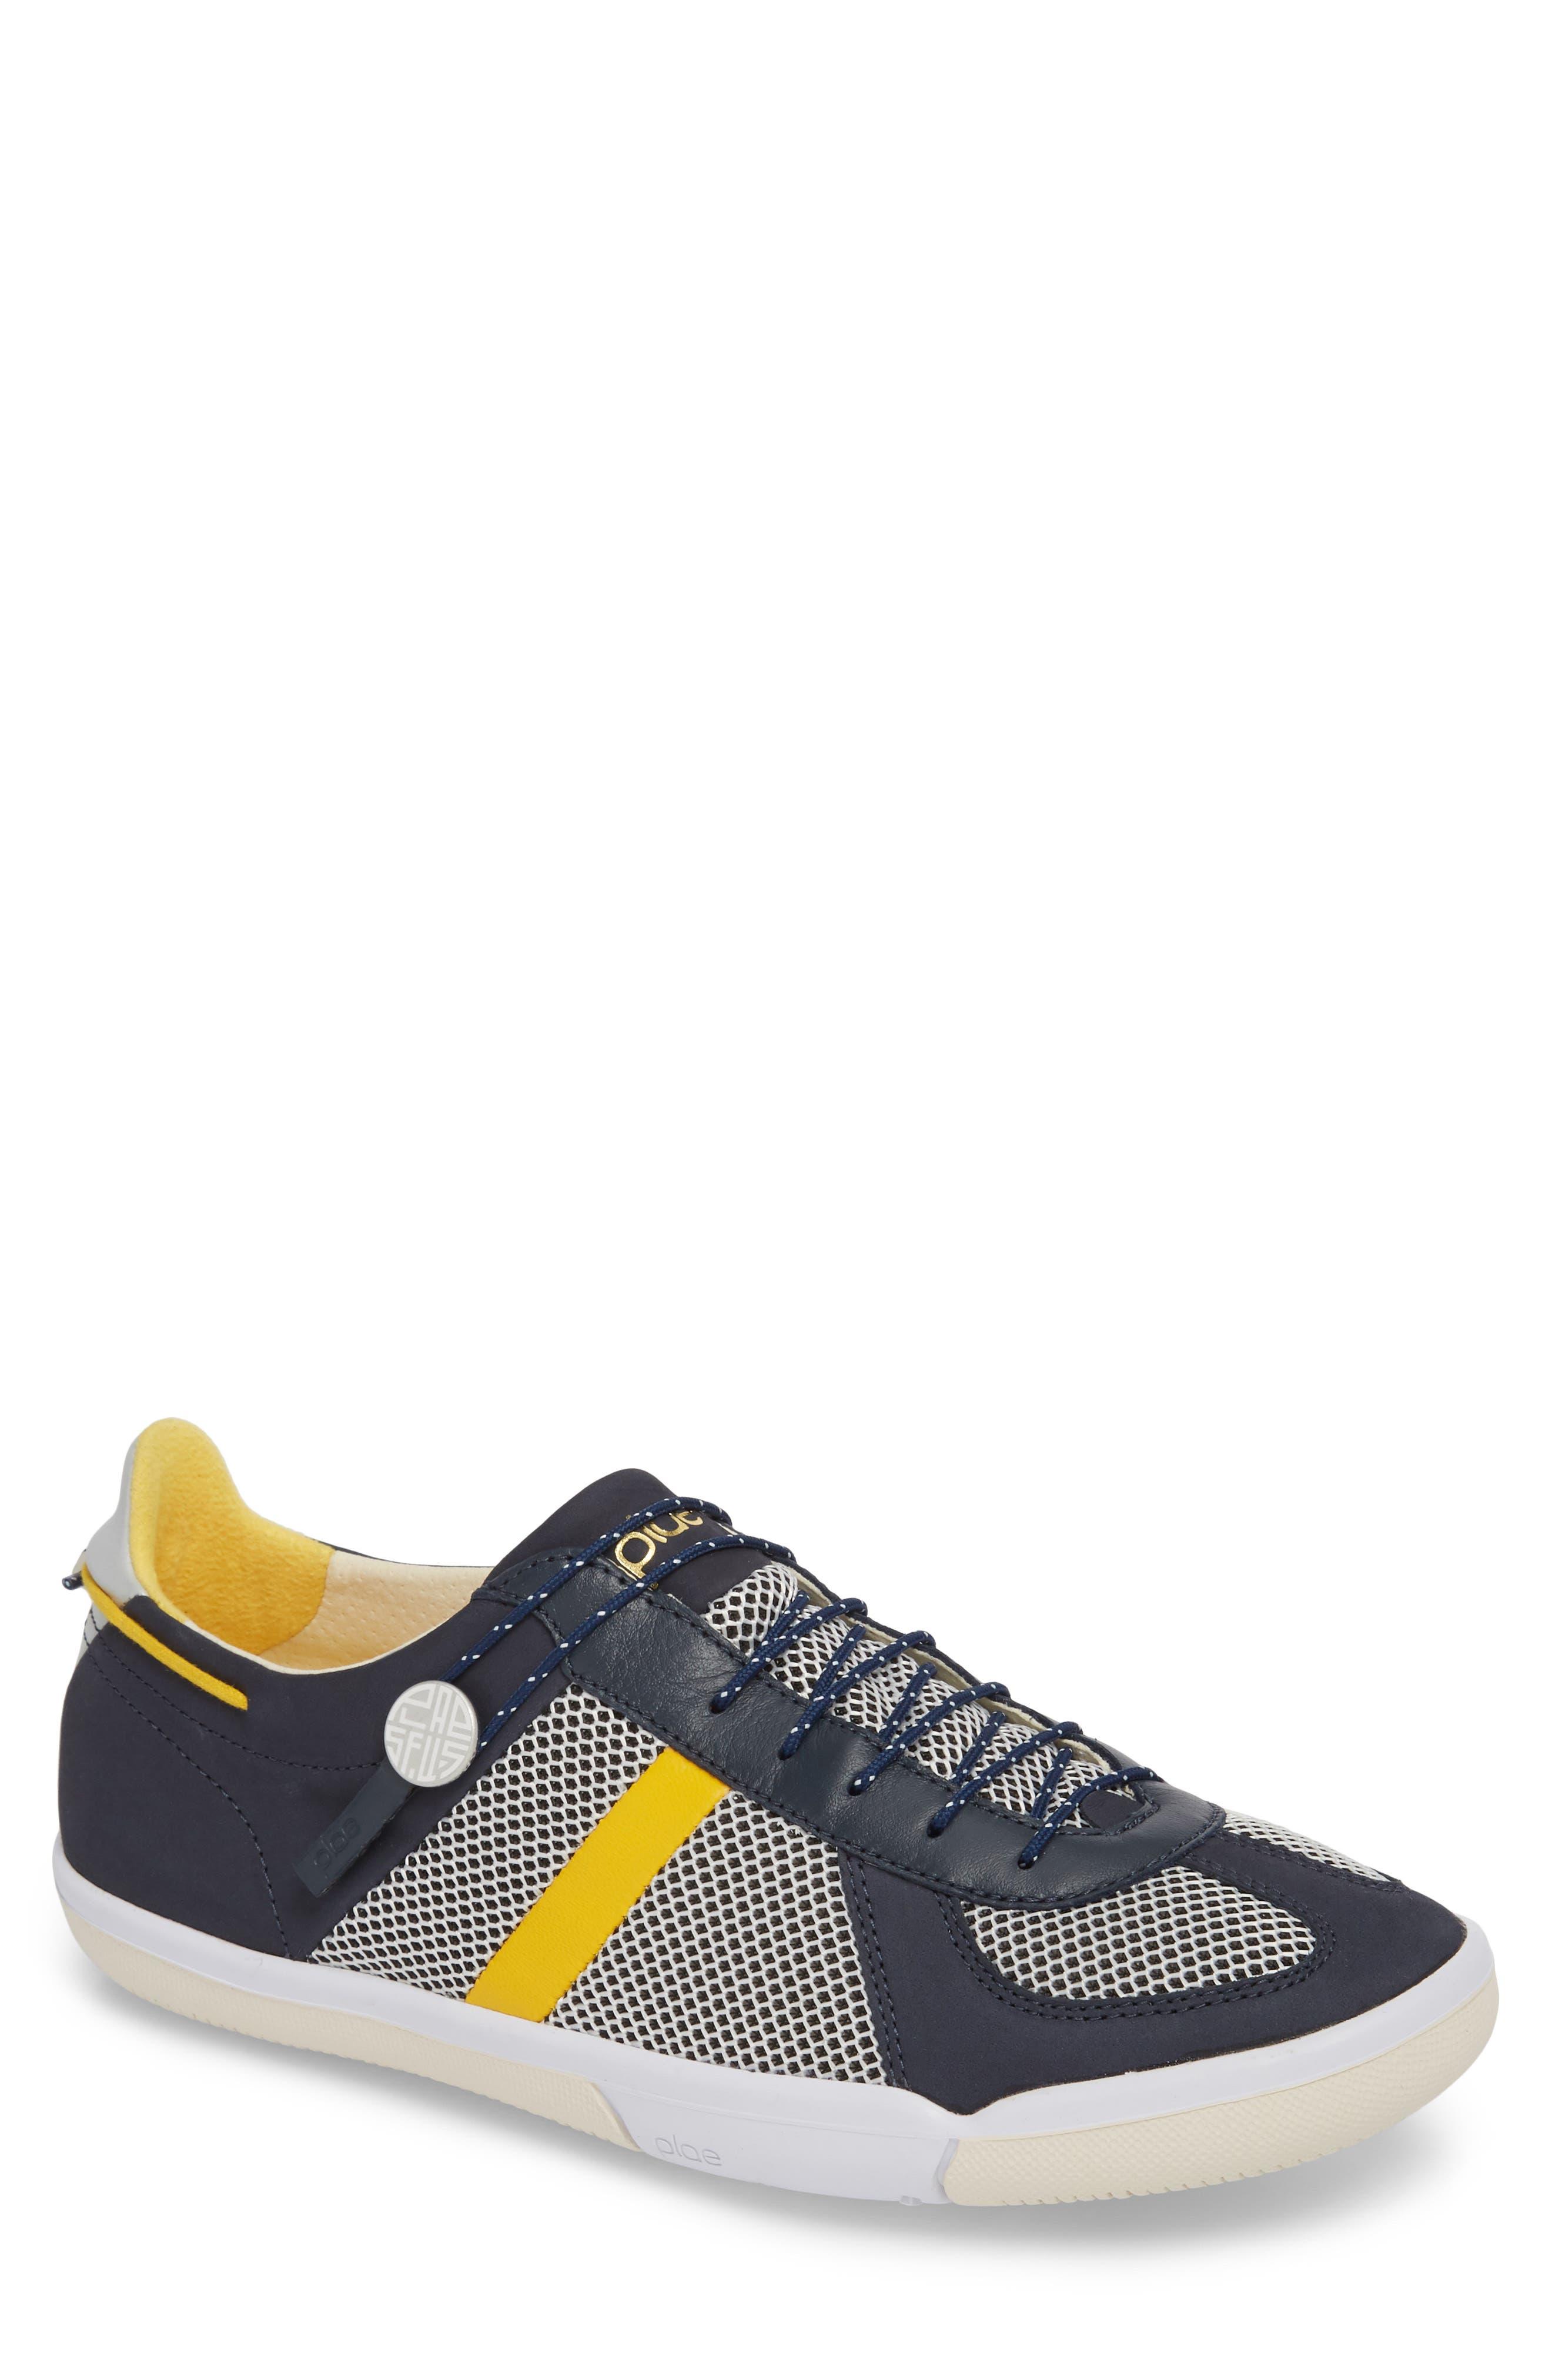 Main Image - PLAE Butler Low-Top Sneaker (Men)